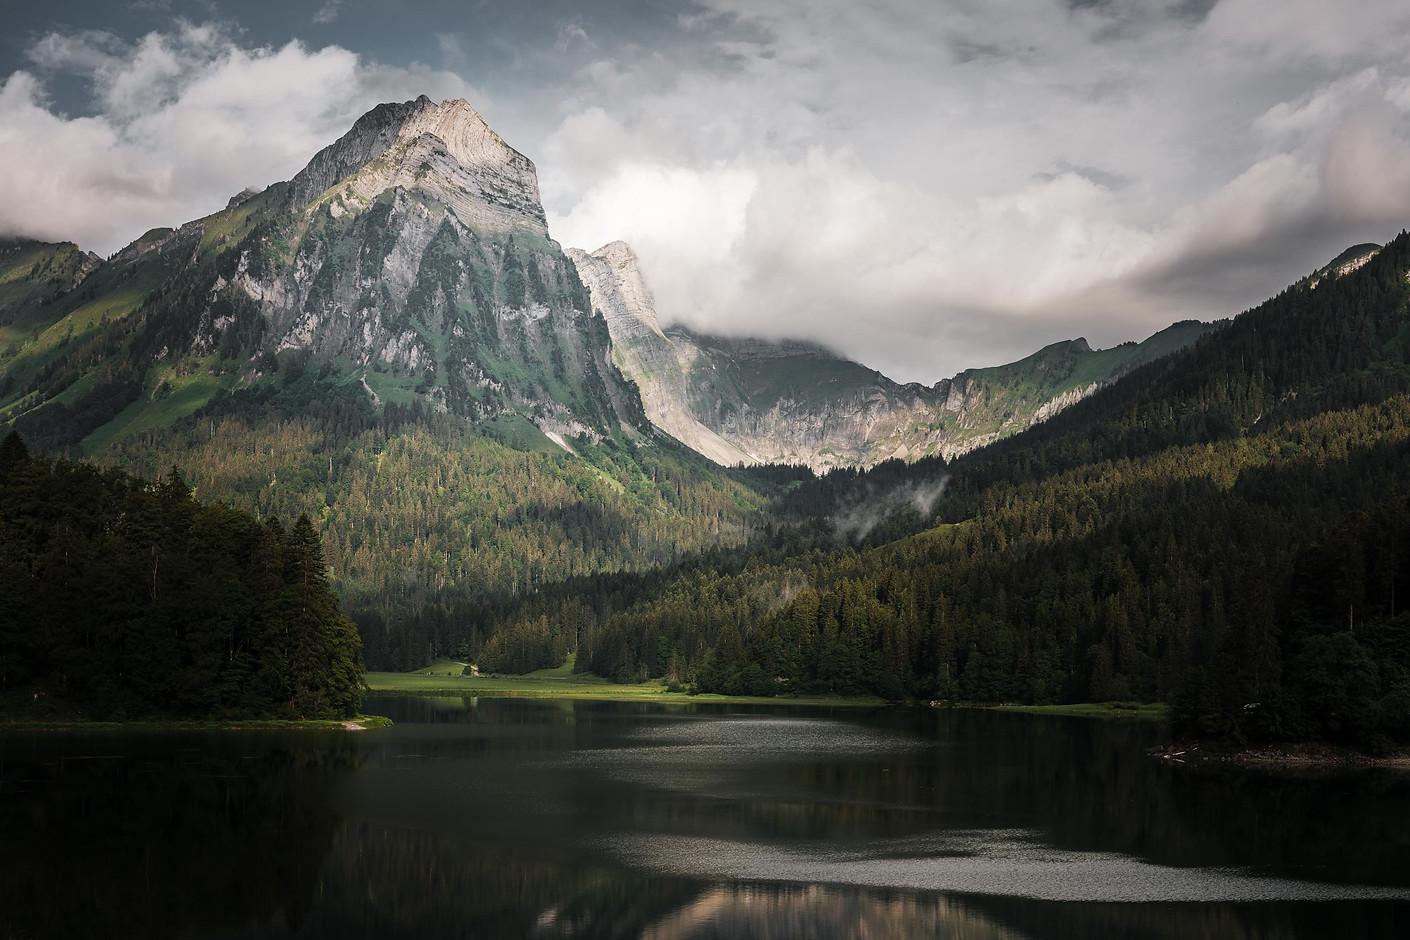 landschaftsfotografie_Schweiz_Engadin_fi